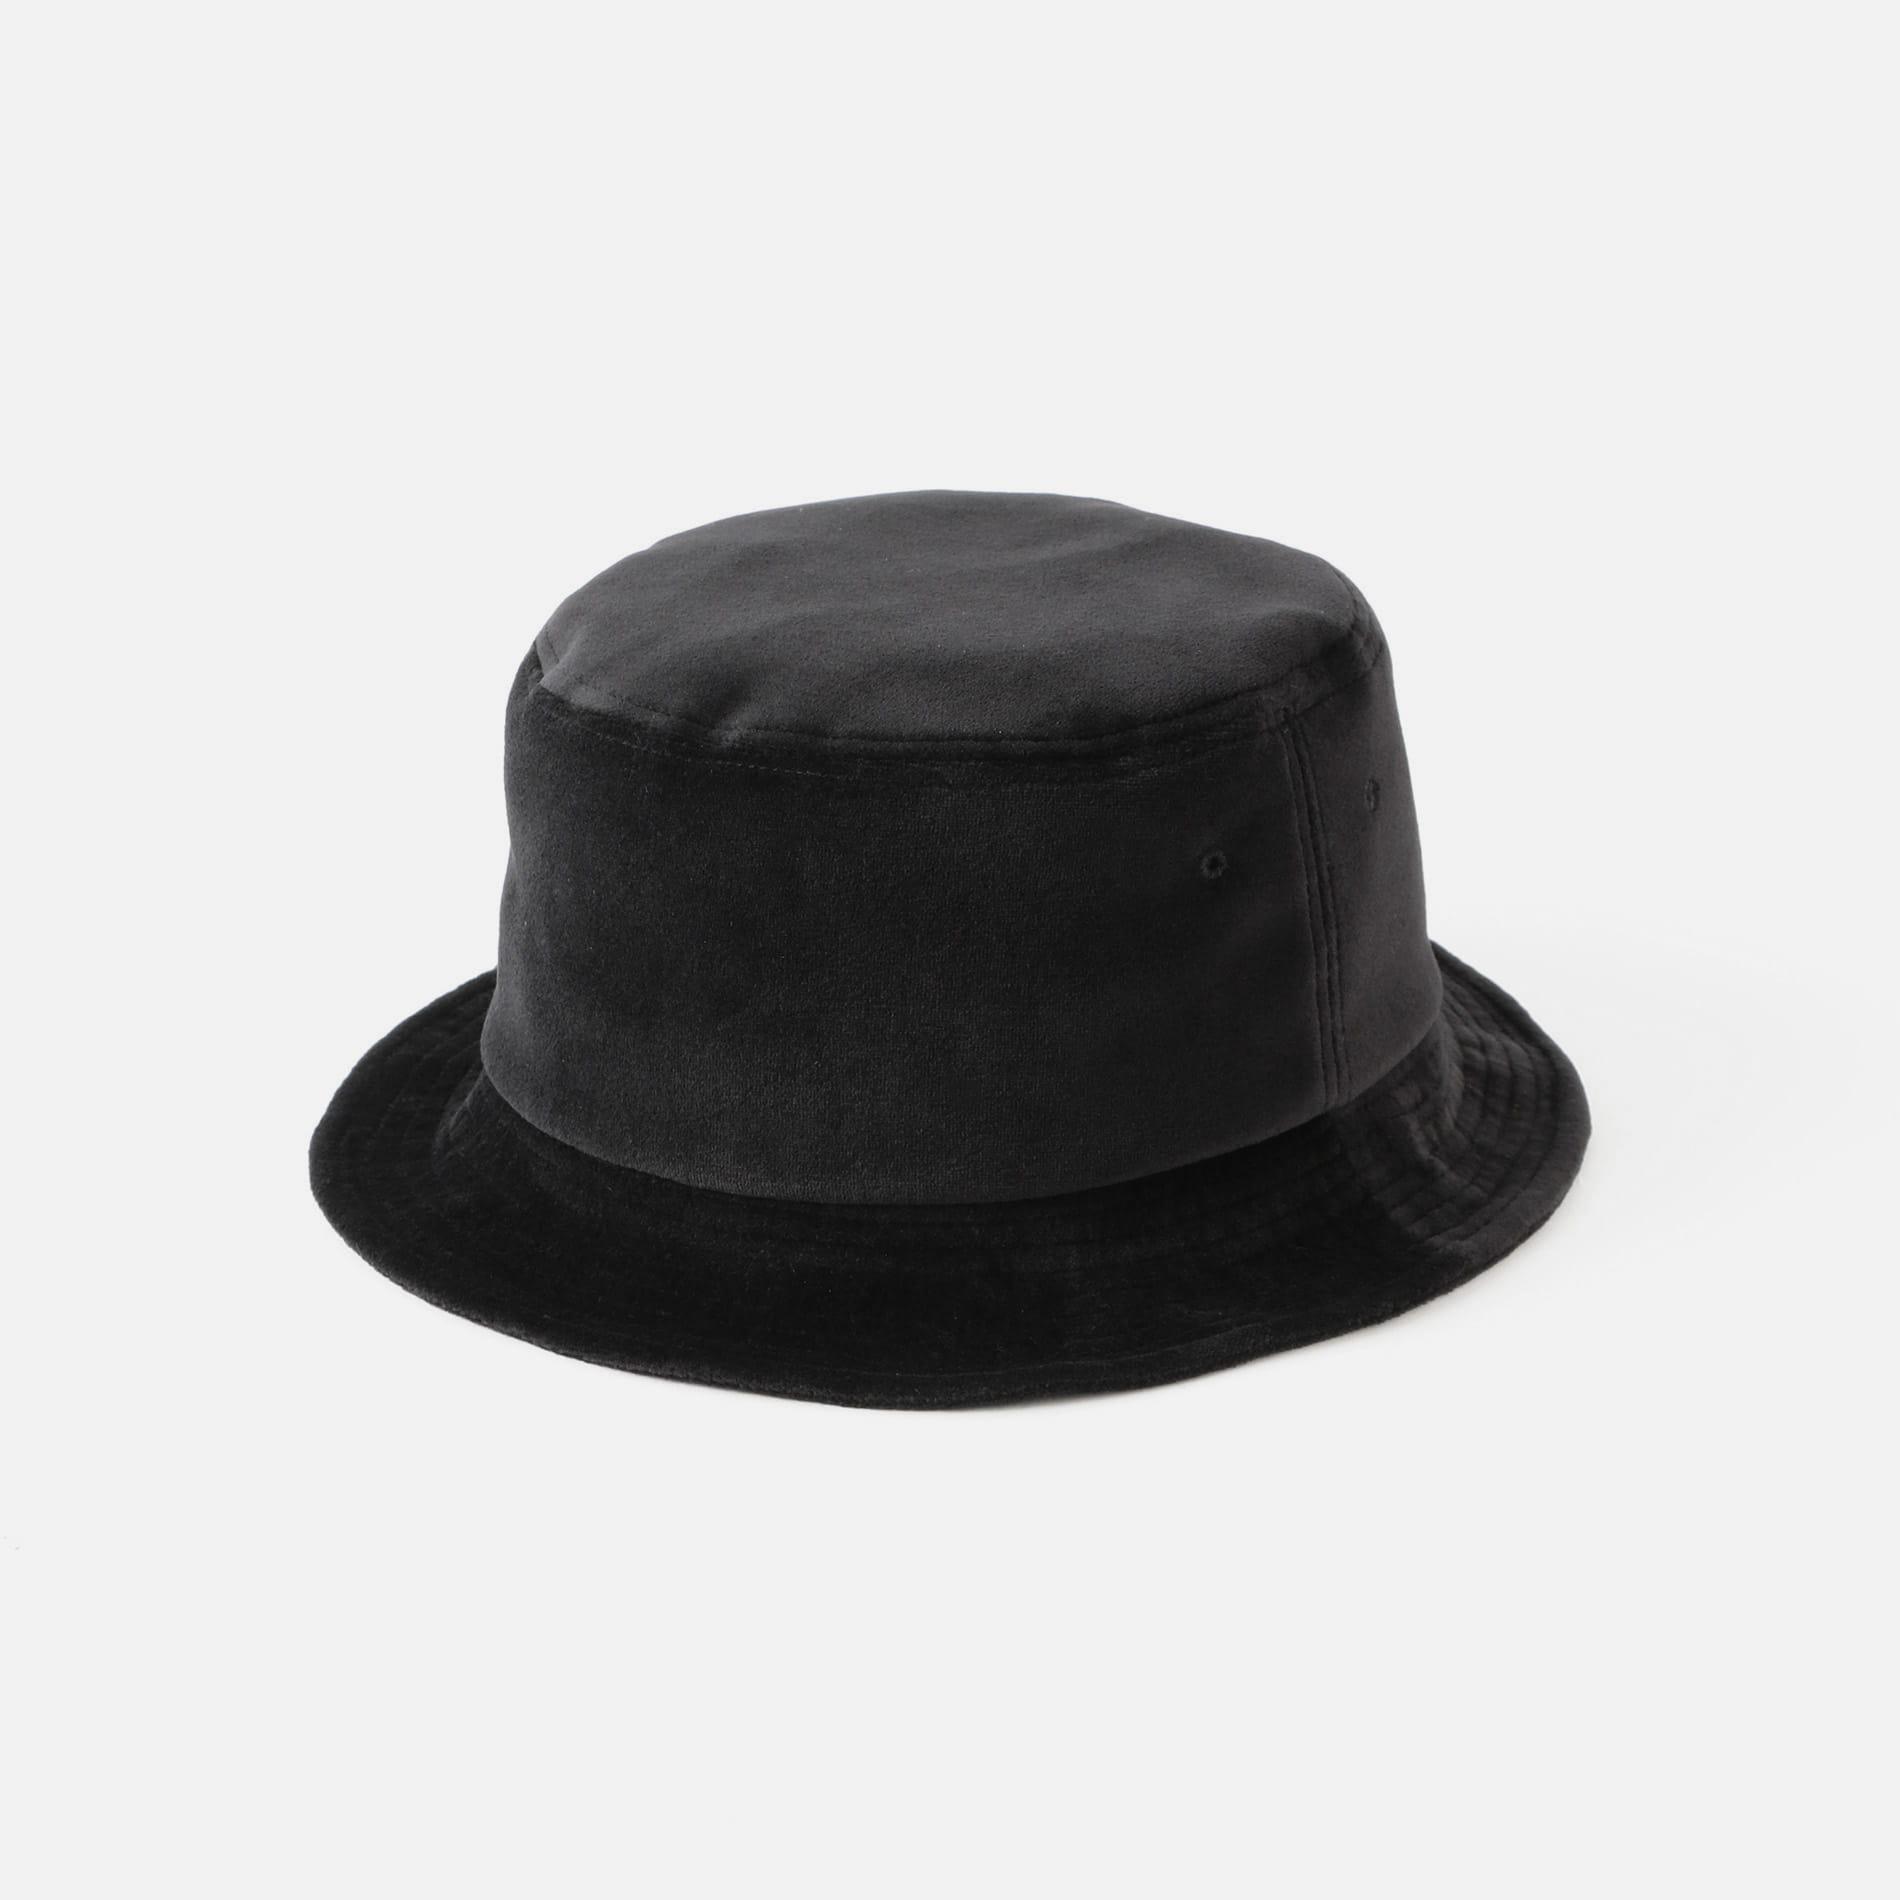 【Charcoal】MEN 帽子 OC Velor Backet Hat 20-22-2-054